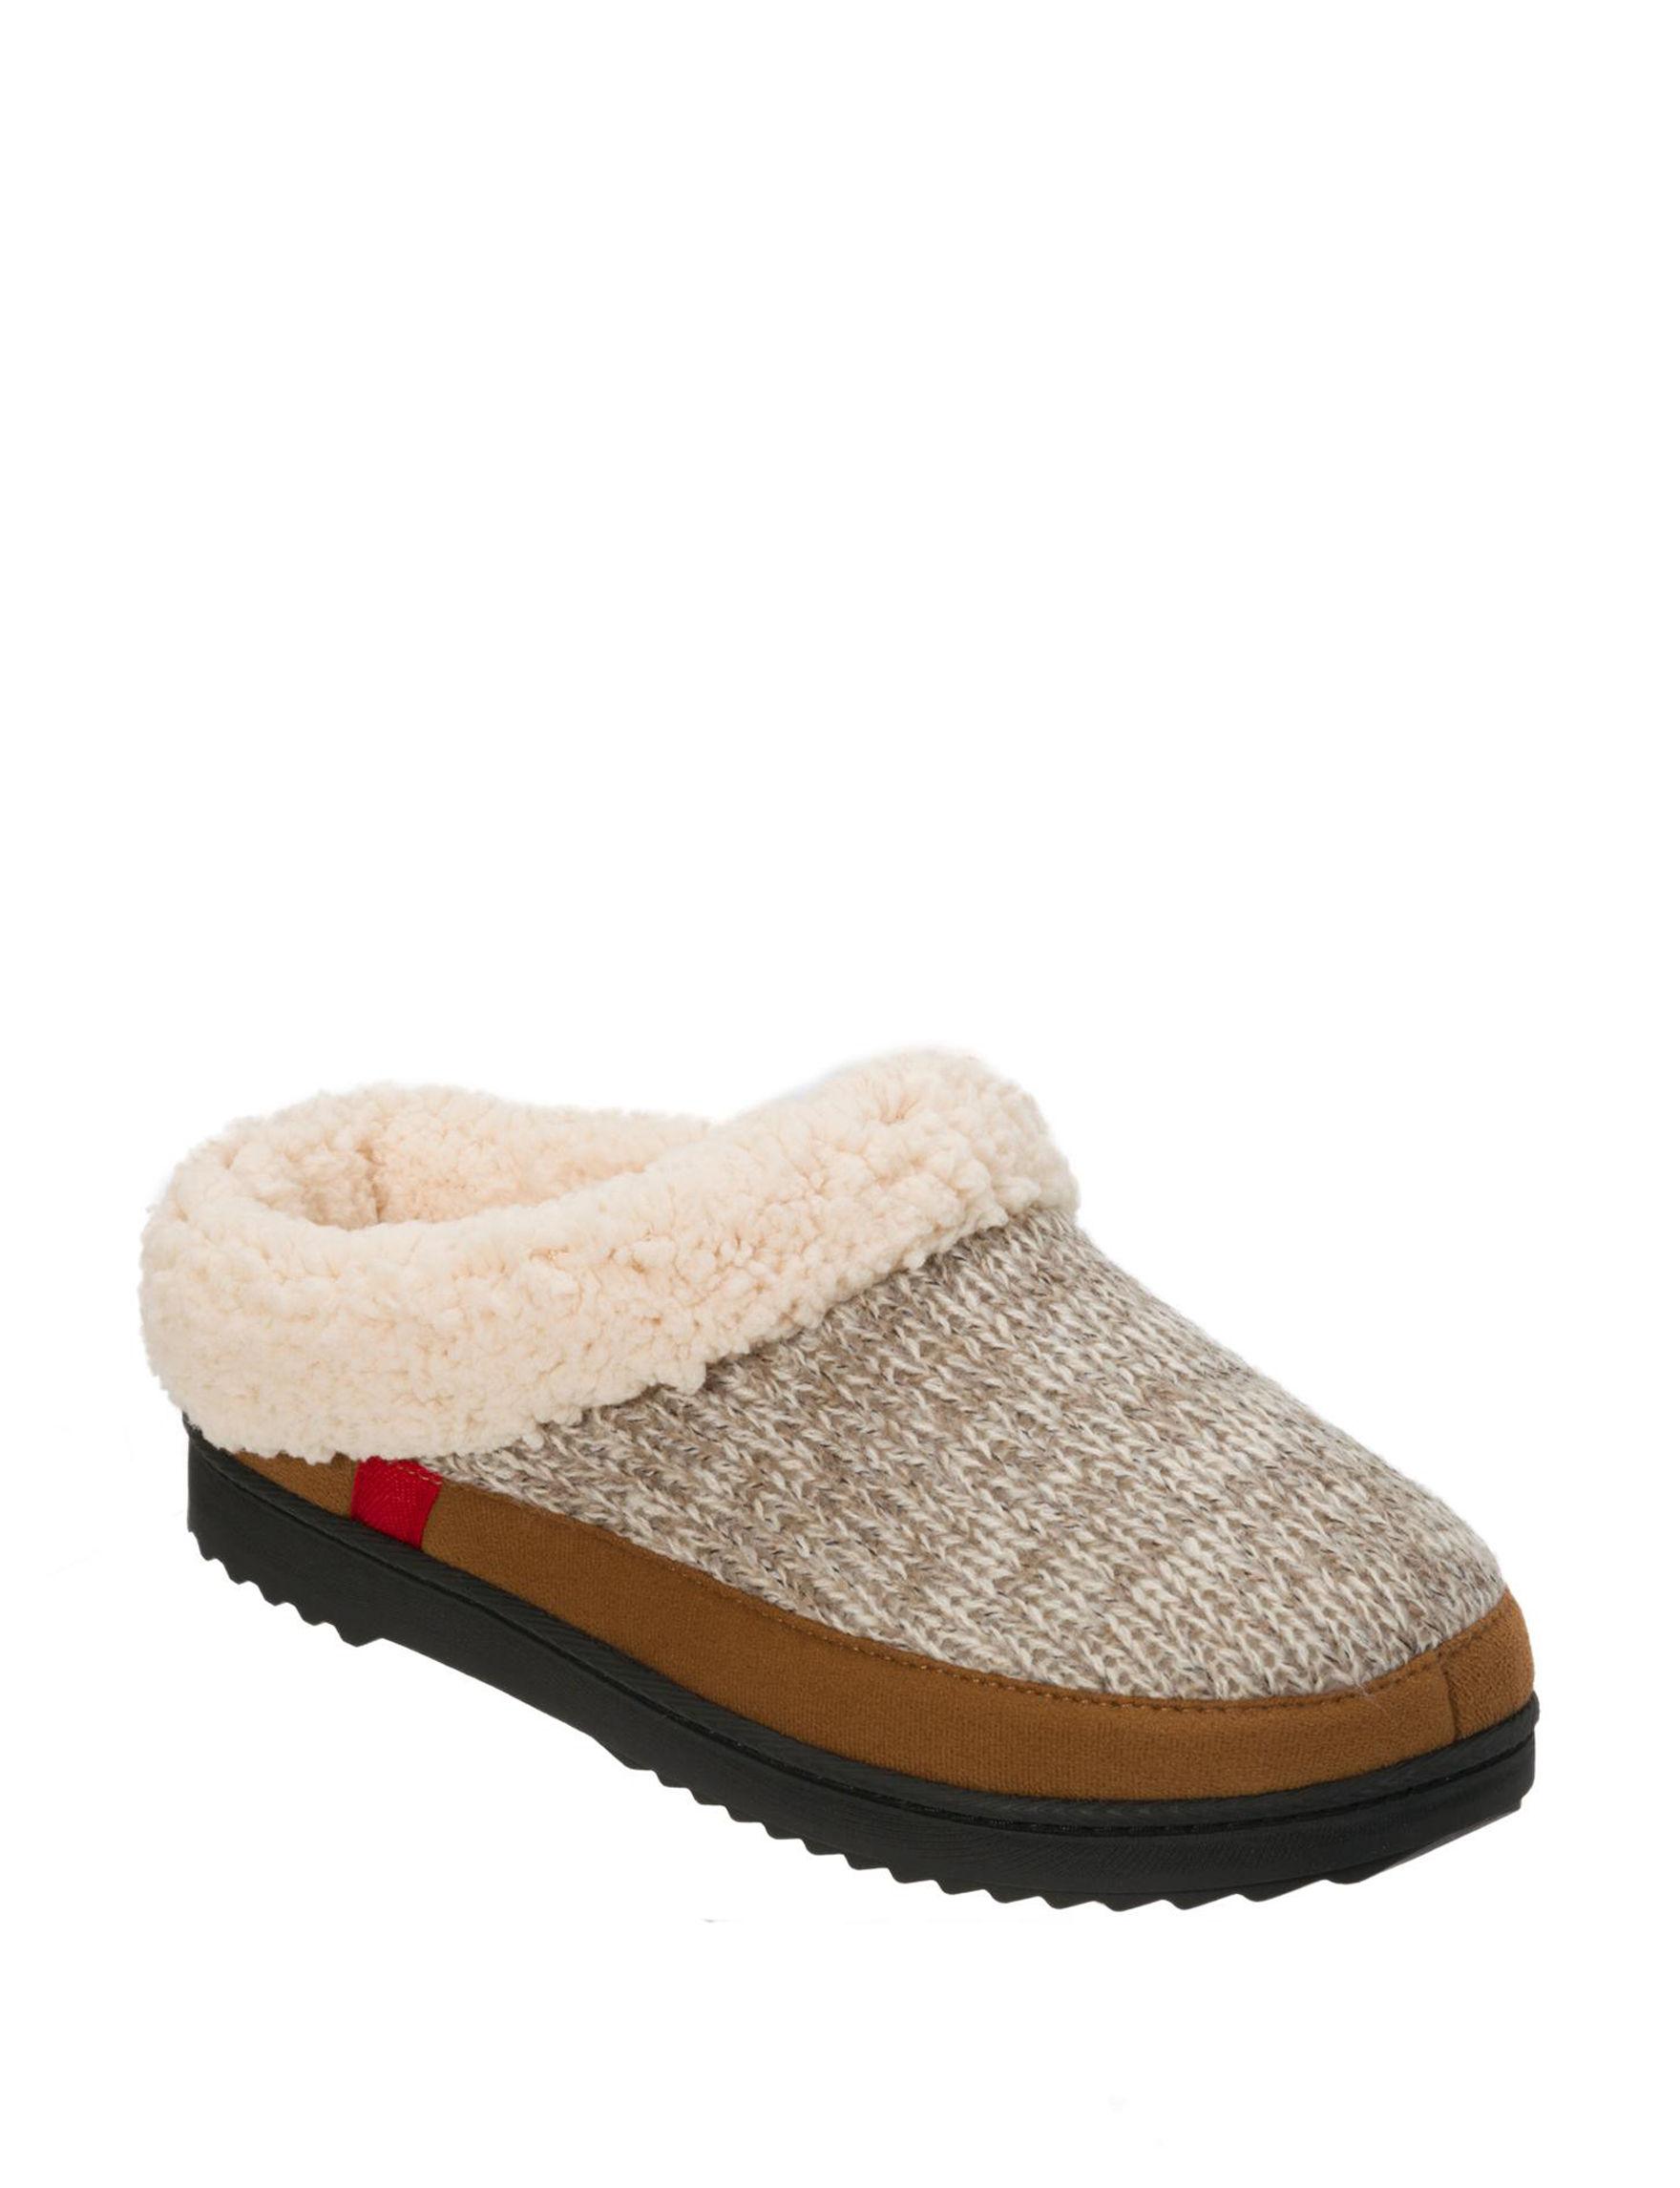 Dearfoams Natural Slipper Shoes